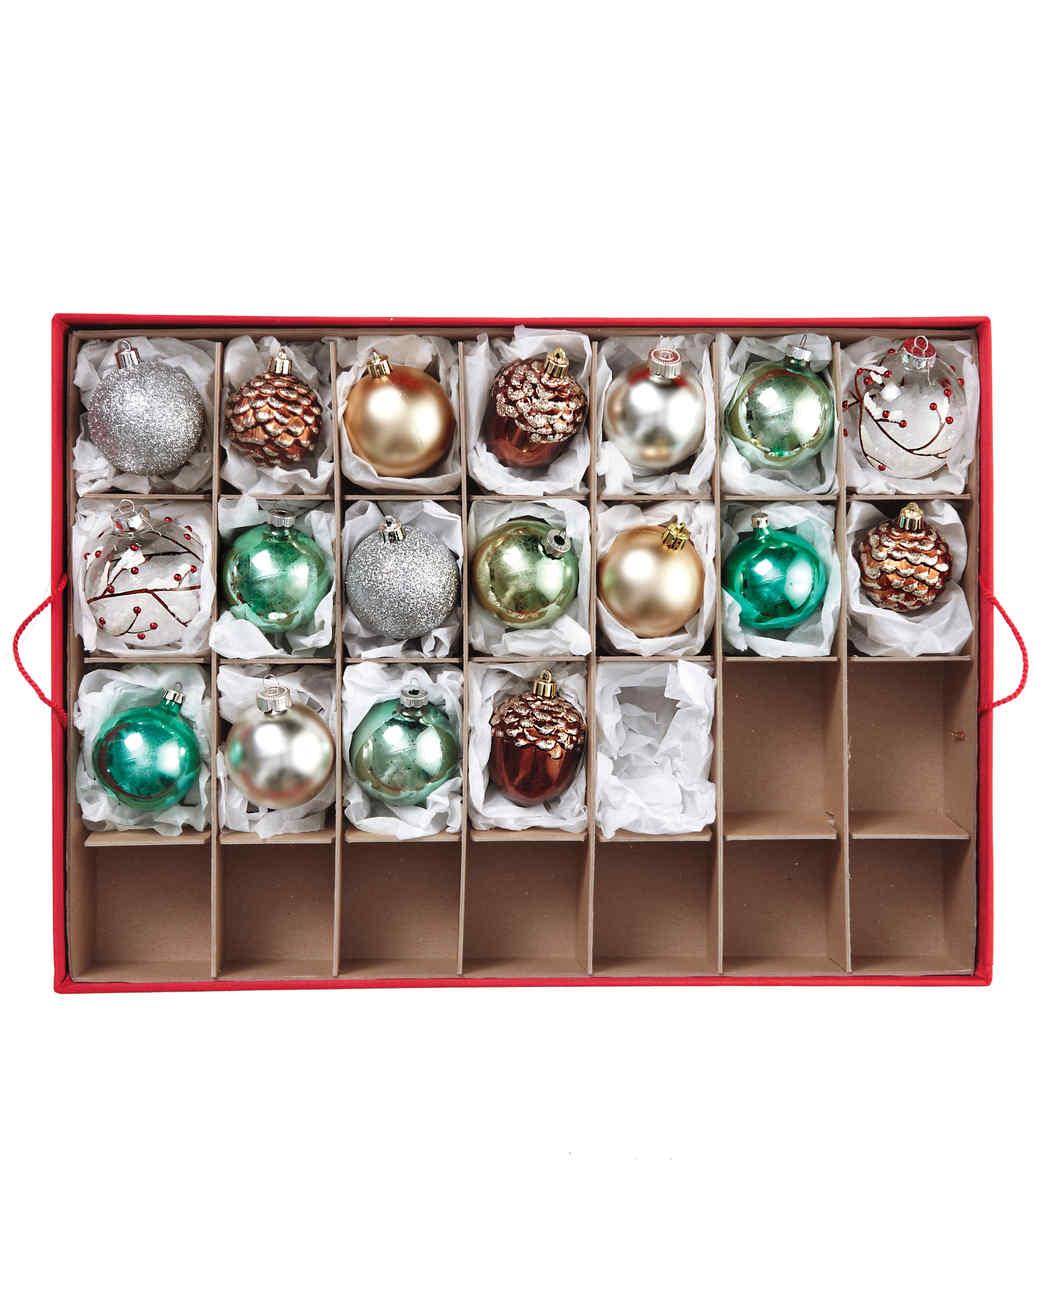 ornament-storage-320-mld110651.jpg